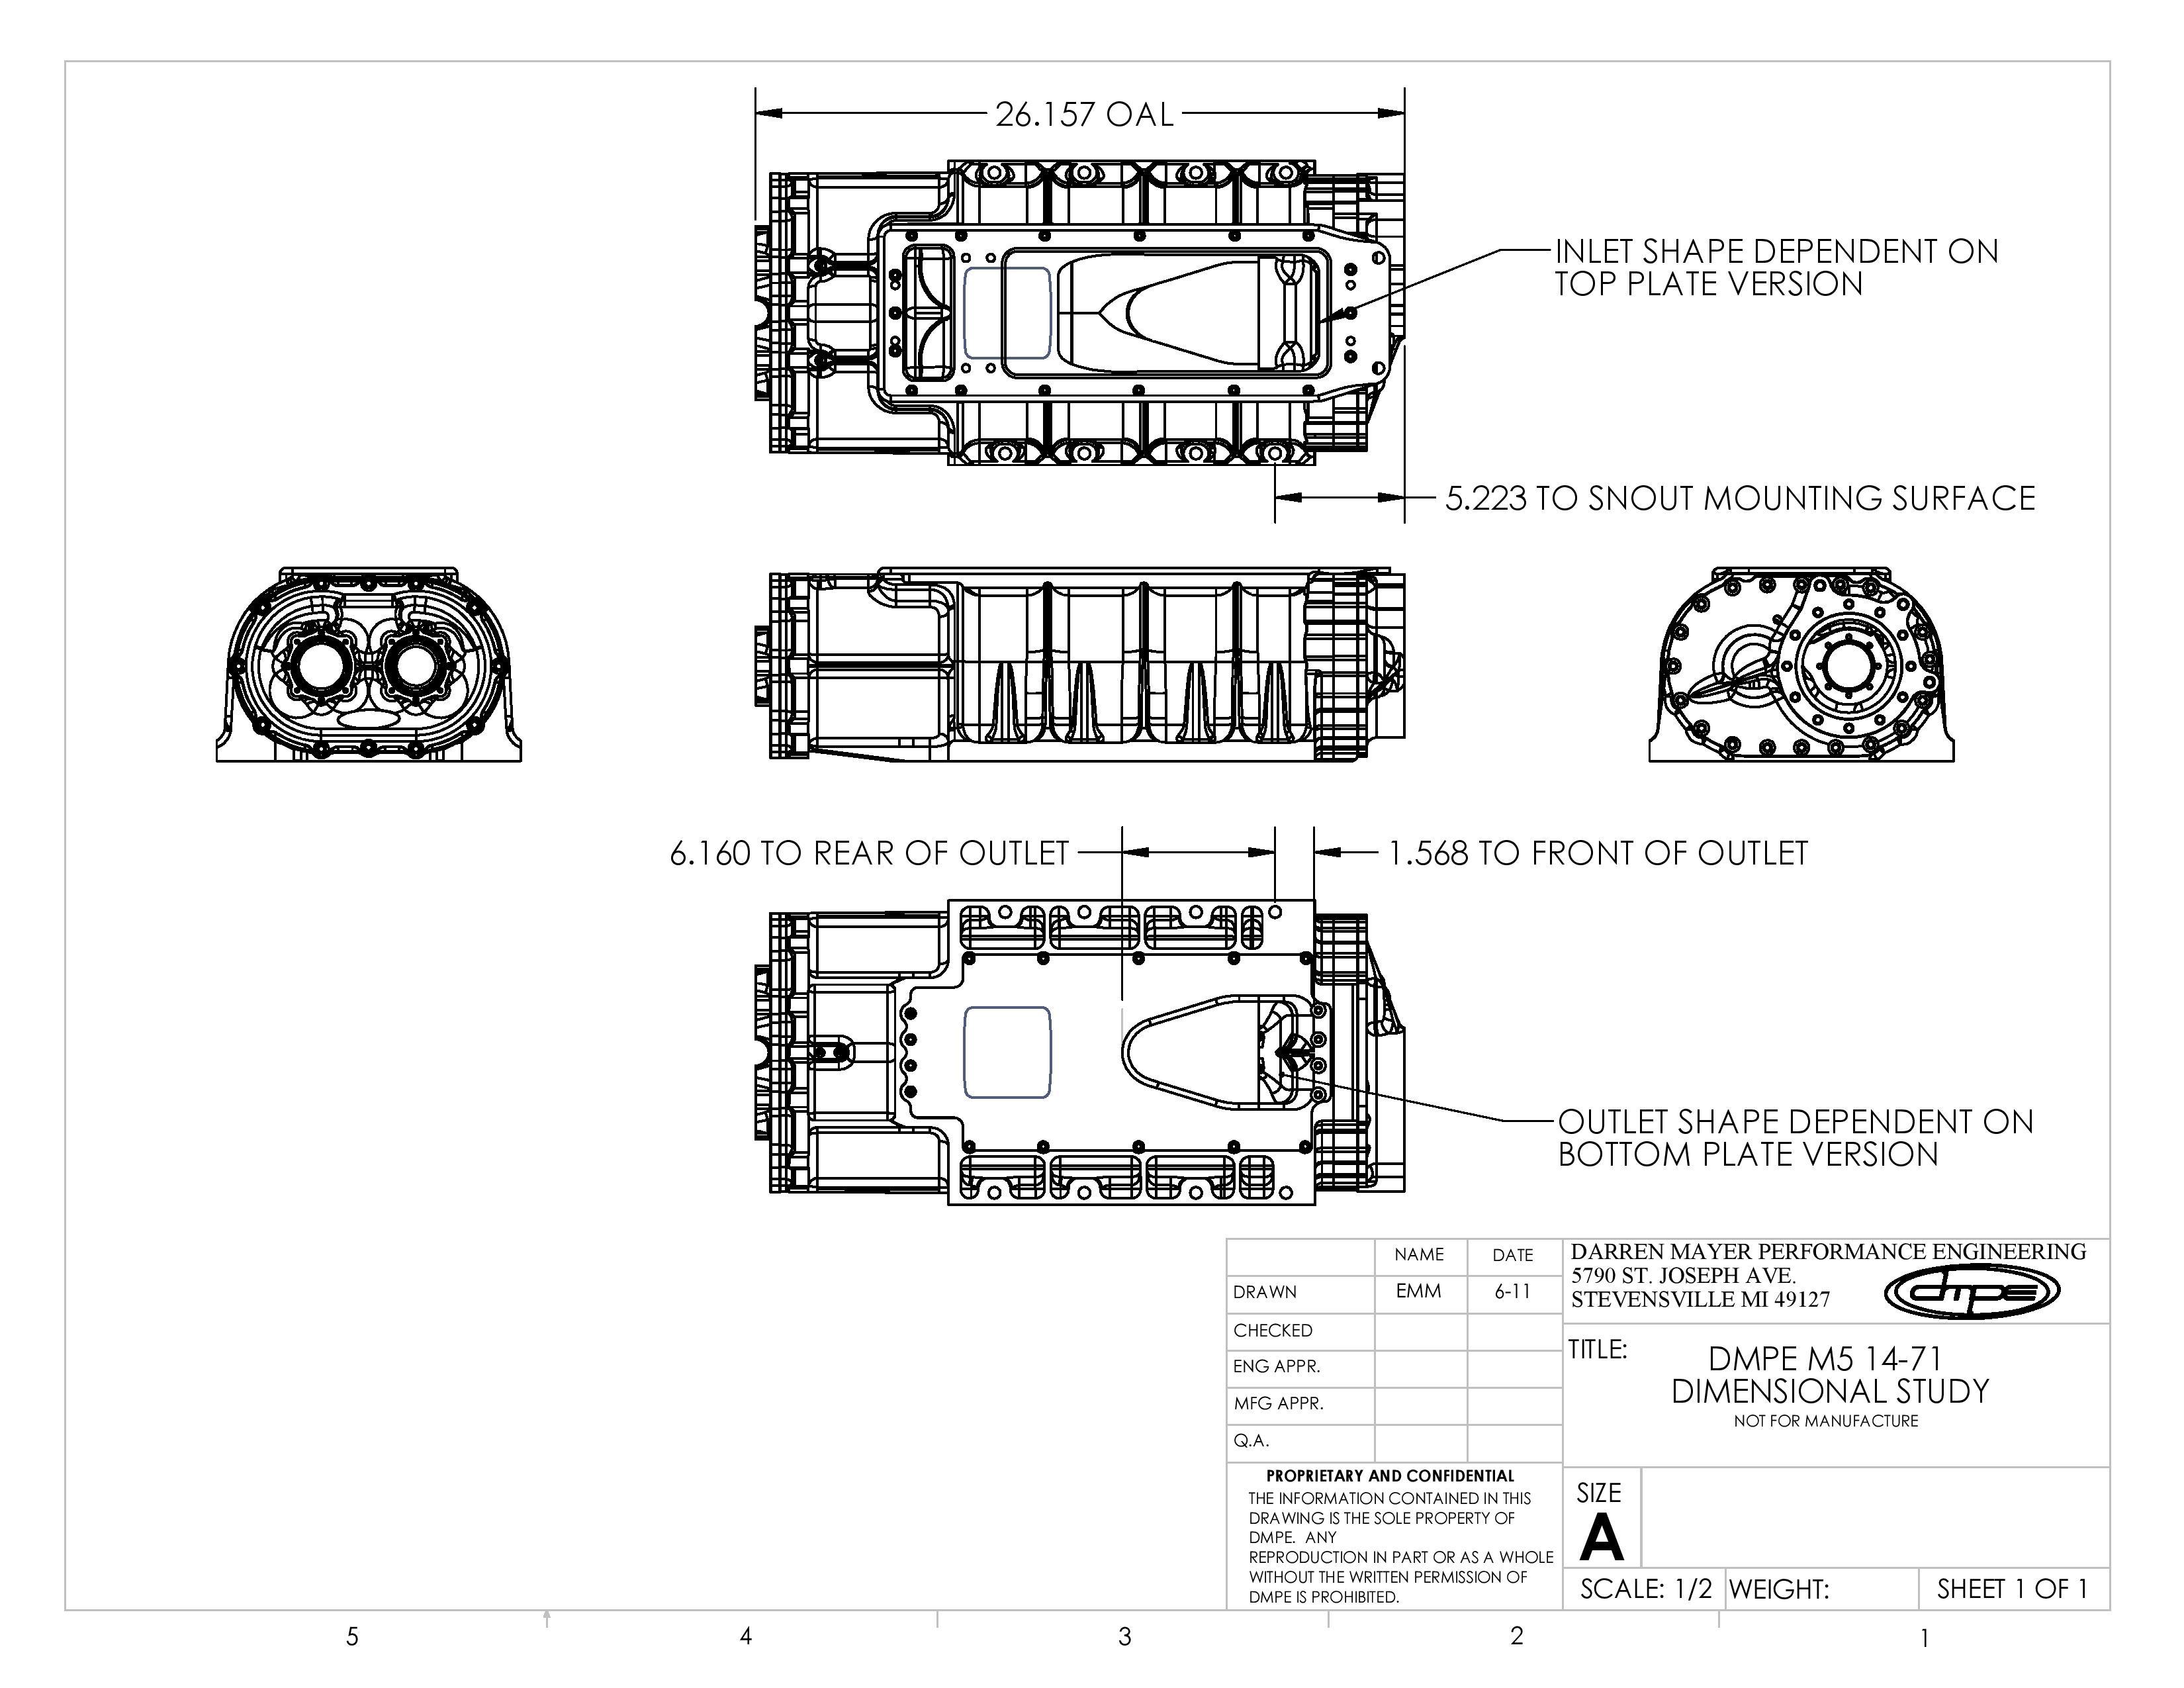 m5-14-71-basic-dimensional-info-1.jpg